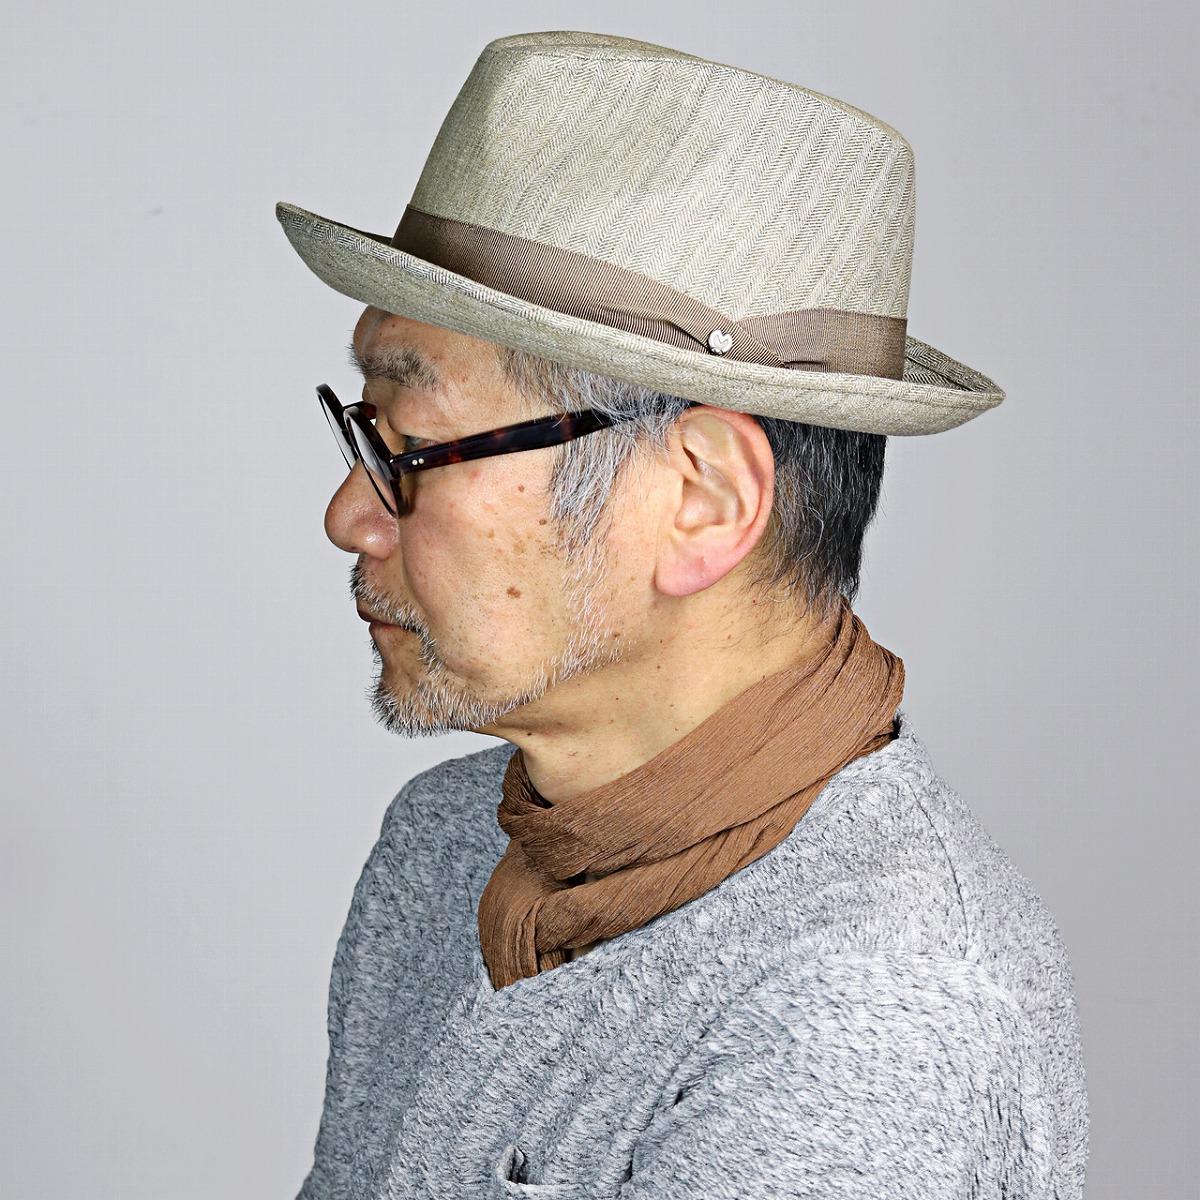 mila schon メンズ ハット ミラショーン 紳士 ニューレスコー型 中折れハット 帽子 紳士 プレゼント 春夏 HAT 麻 上品 ベージュ [ fedora ] [ hat ] (中折れ帽 中折れ 中折れ帽子 彼氏 バレンタイン 紳士帽子)